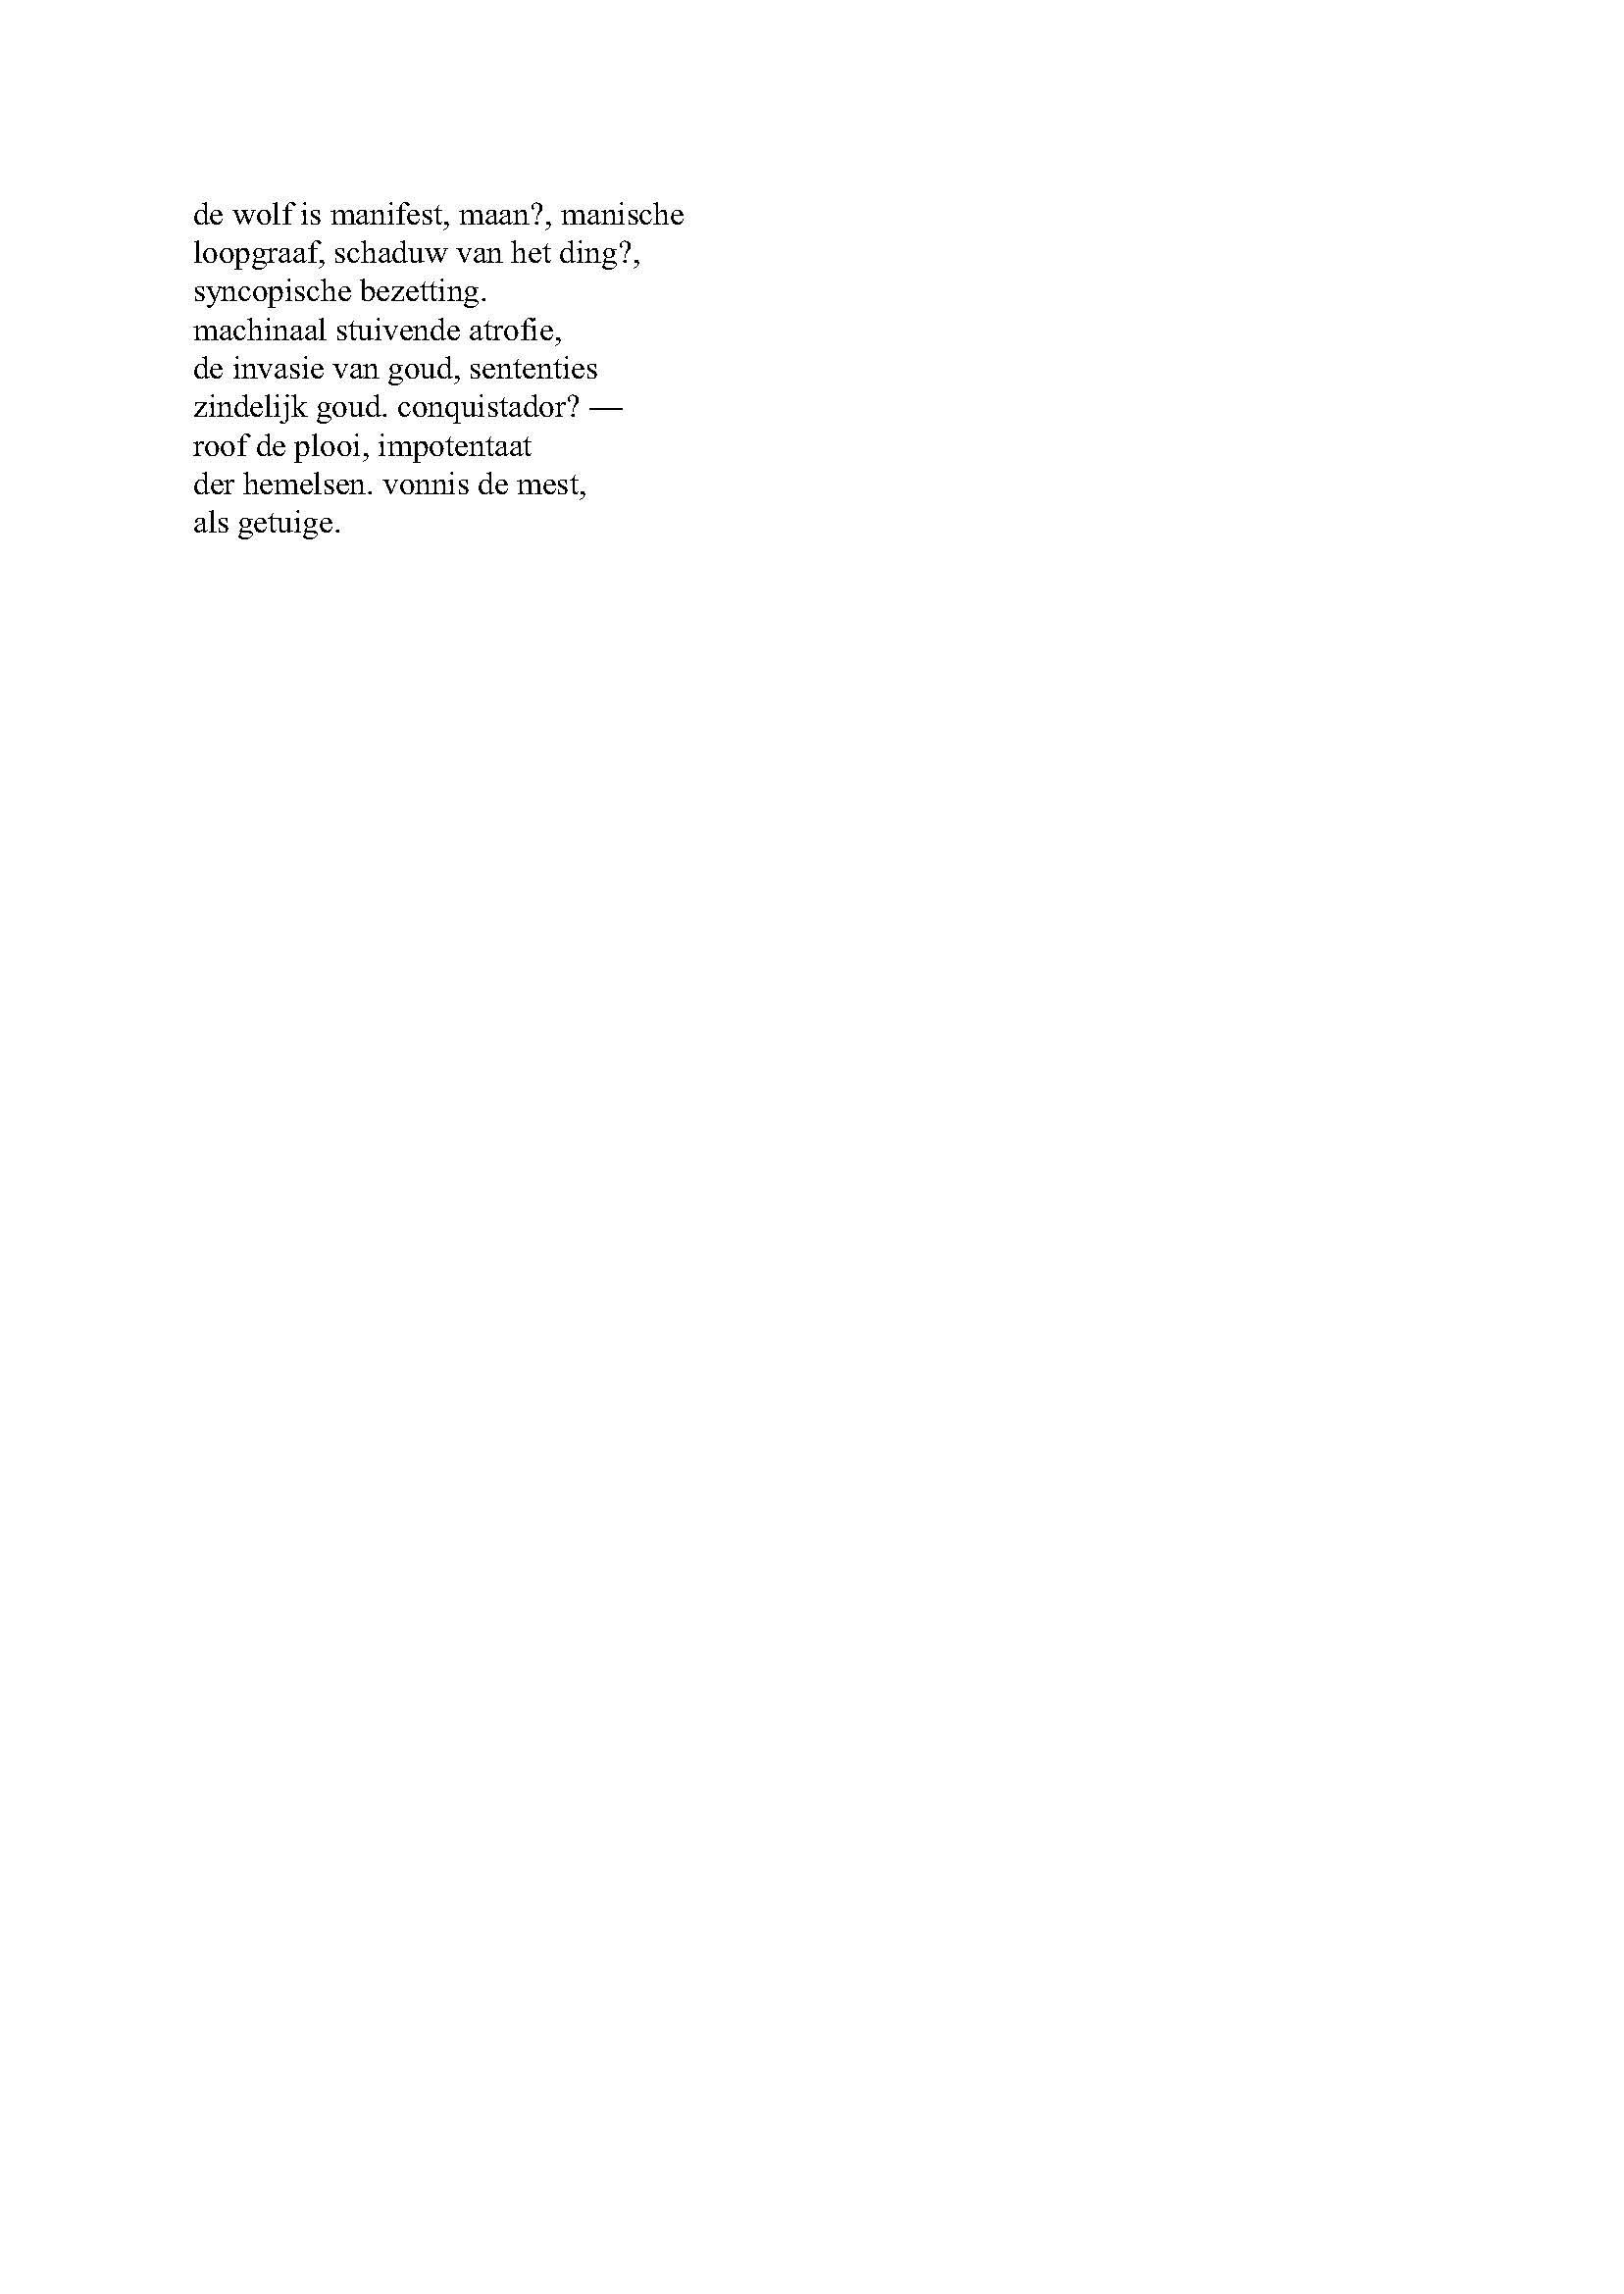 de grote middag - binnenwerk pagina 24